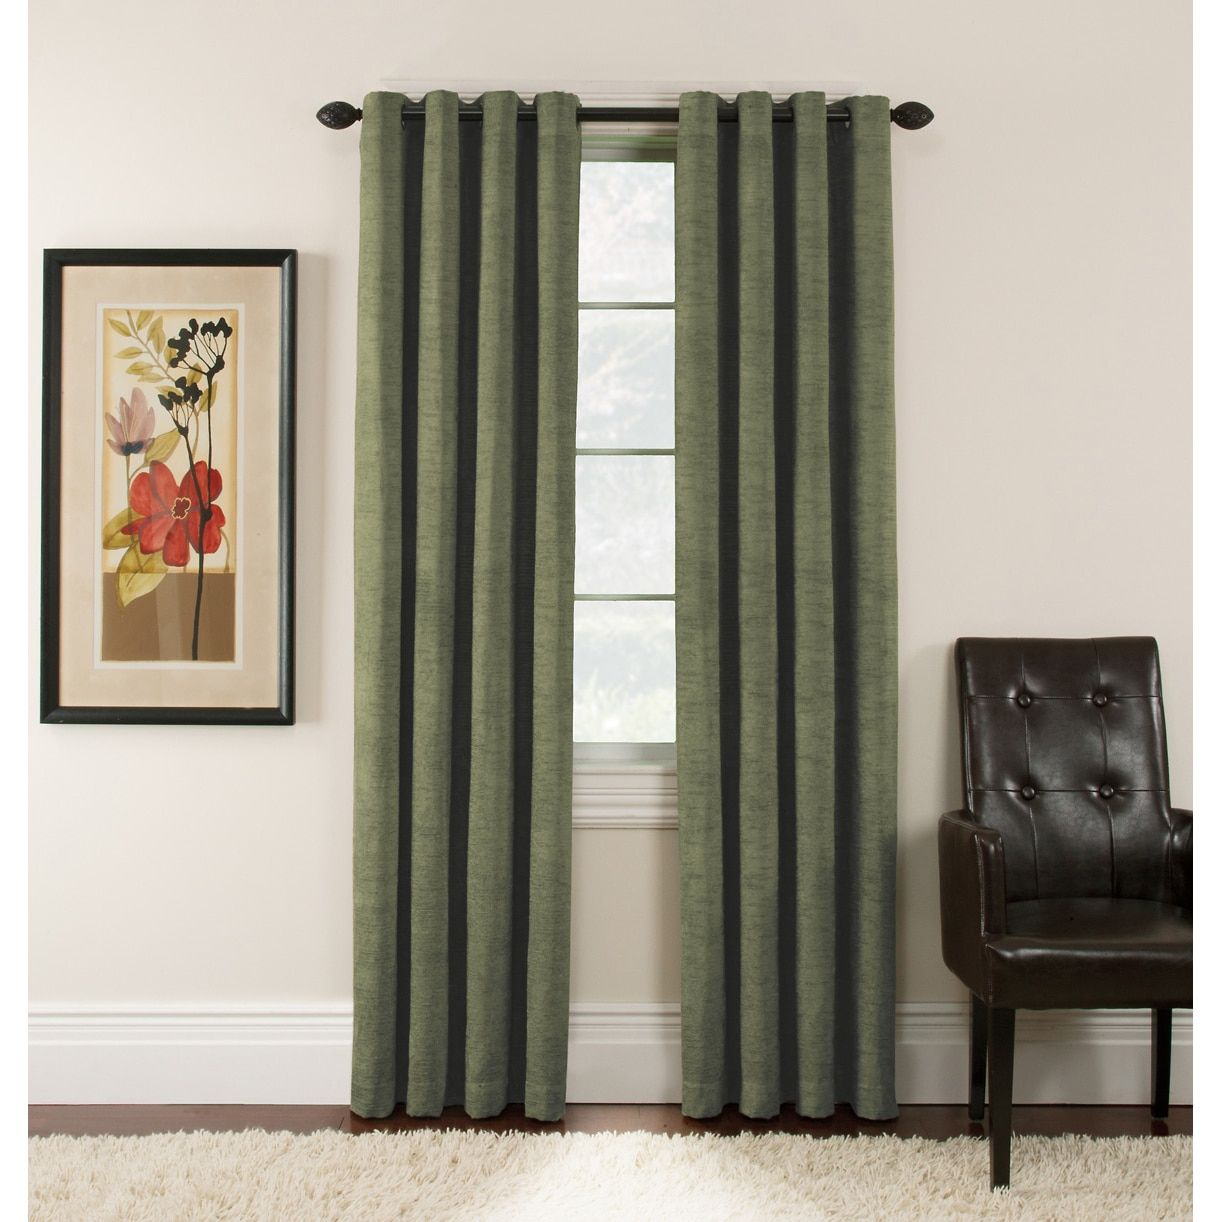 Office window coverings  antique velvet inch blackout grommet top panel pair  overstock